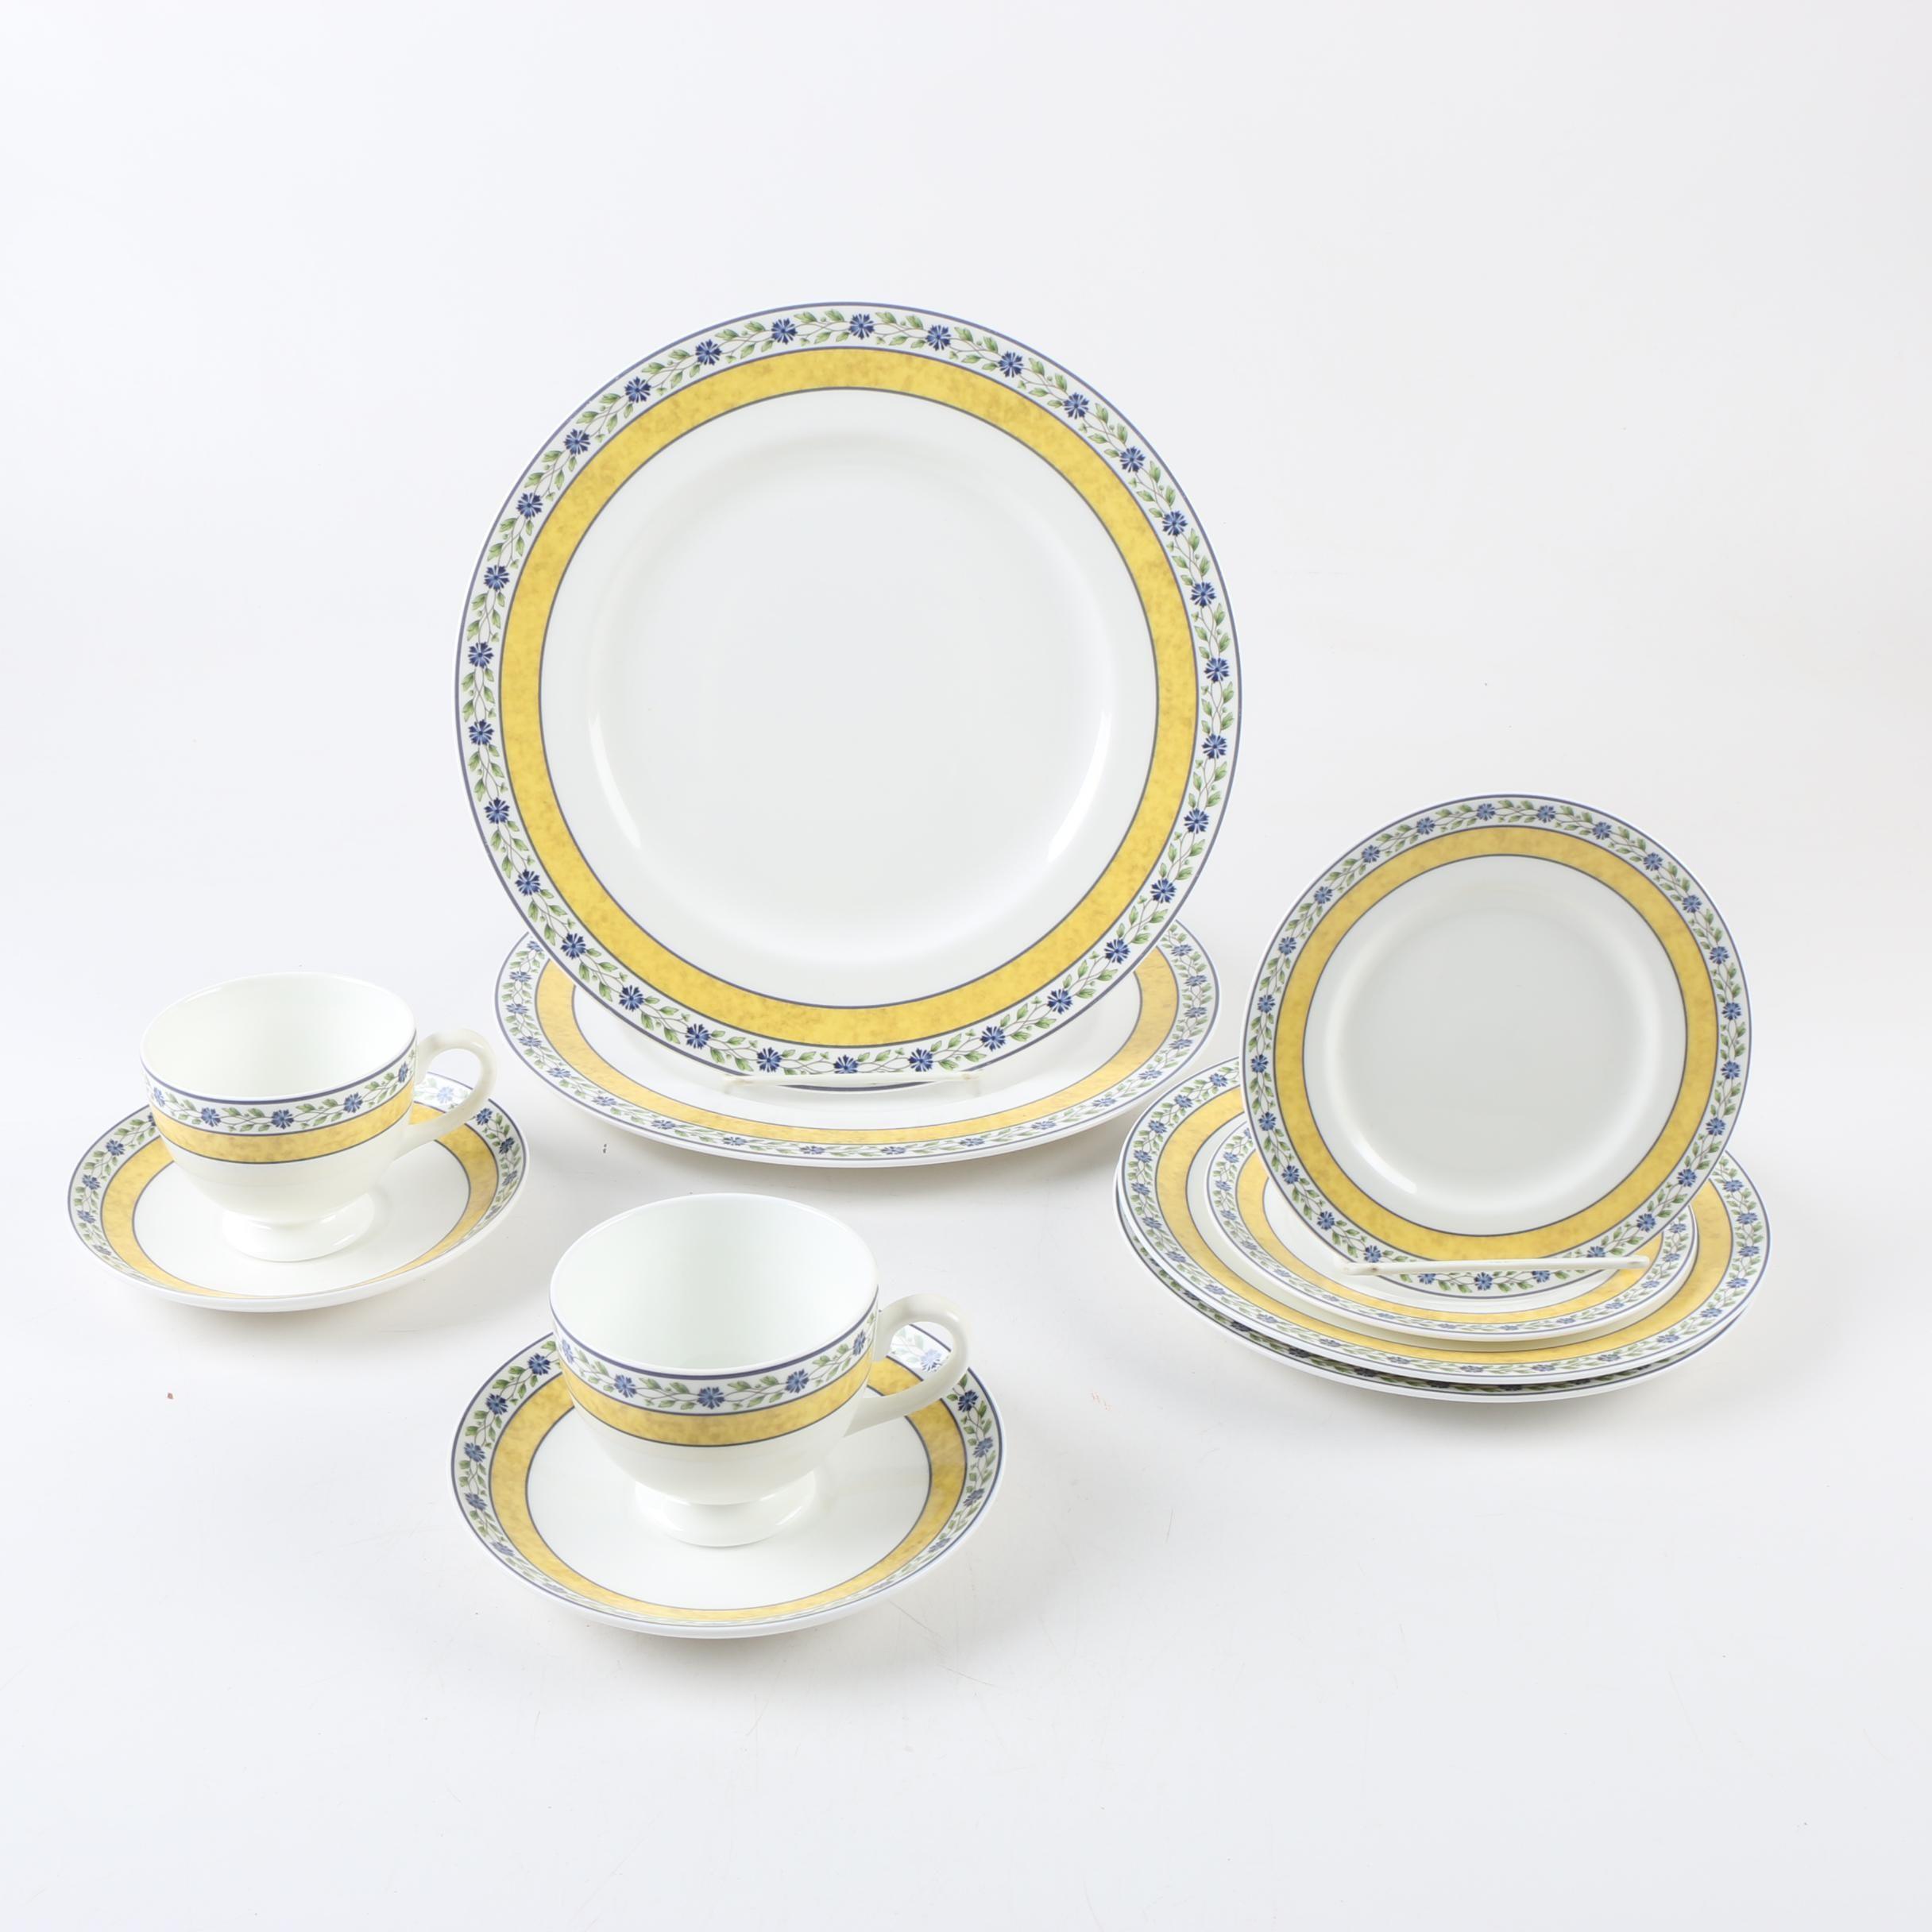 Wedgwood \ Mistral\  Bone China Tableware ...  sc 1 st  EBTH.com & Wedgwood \